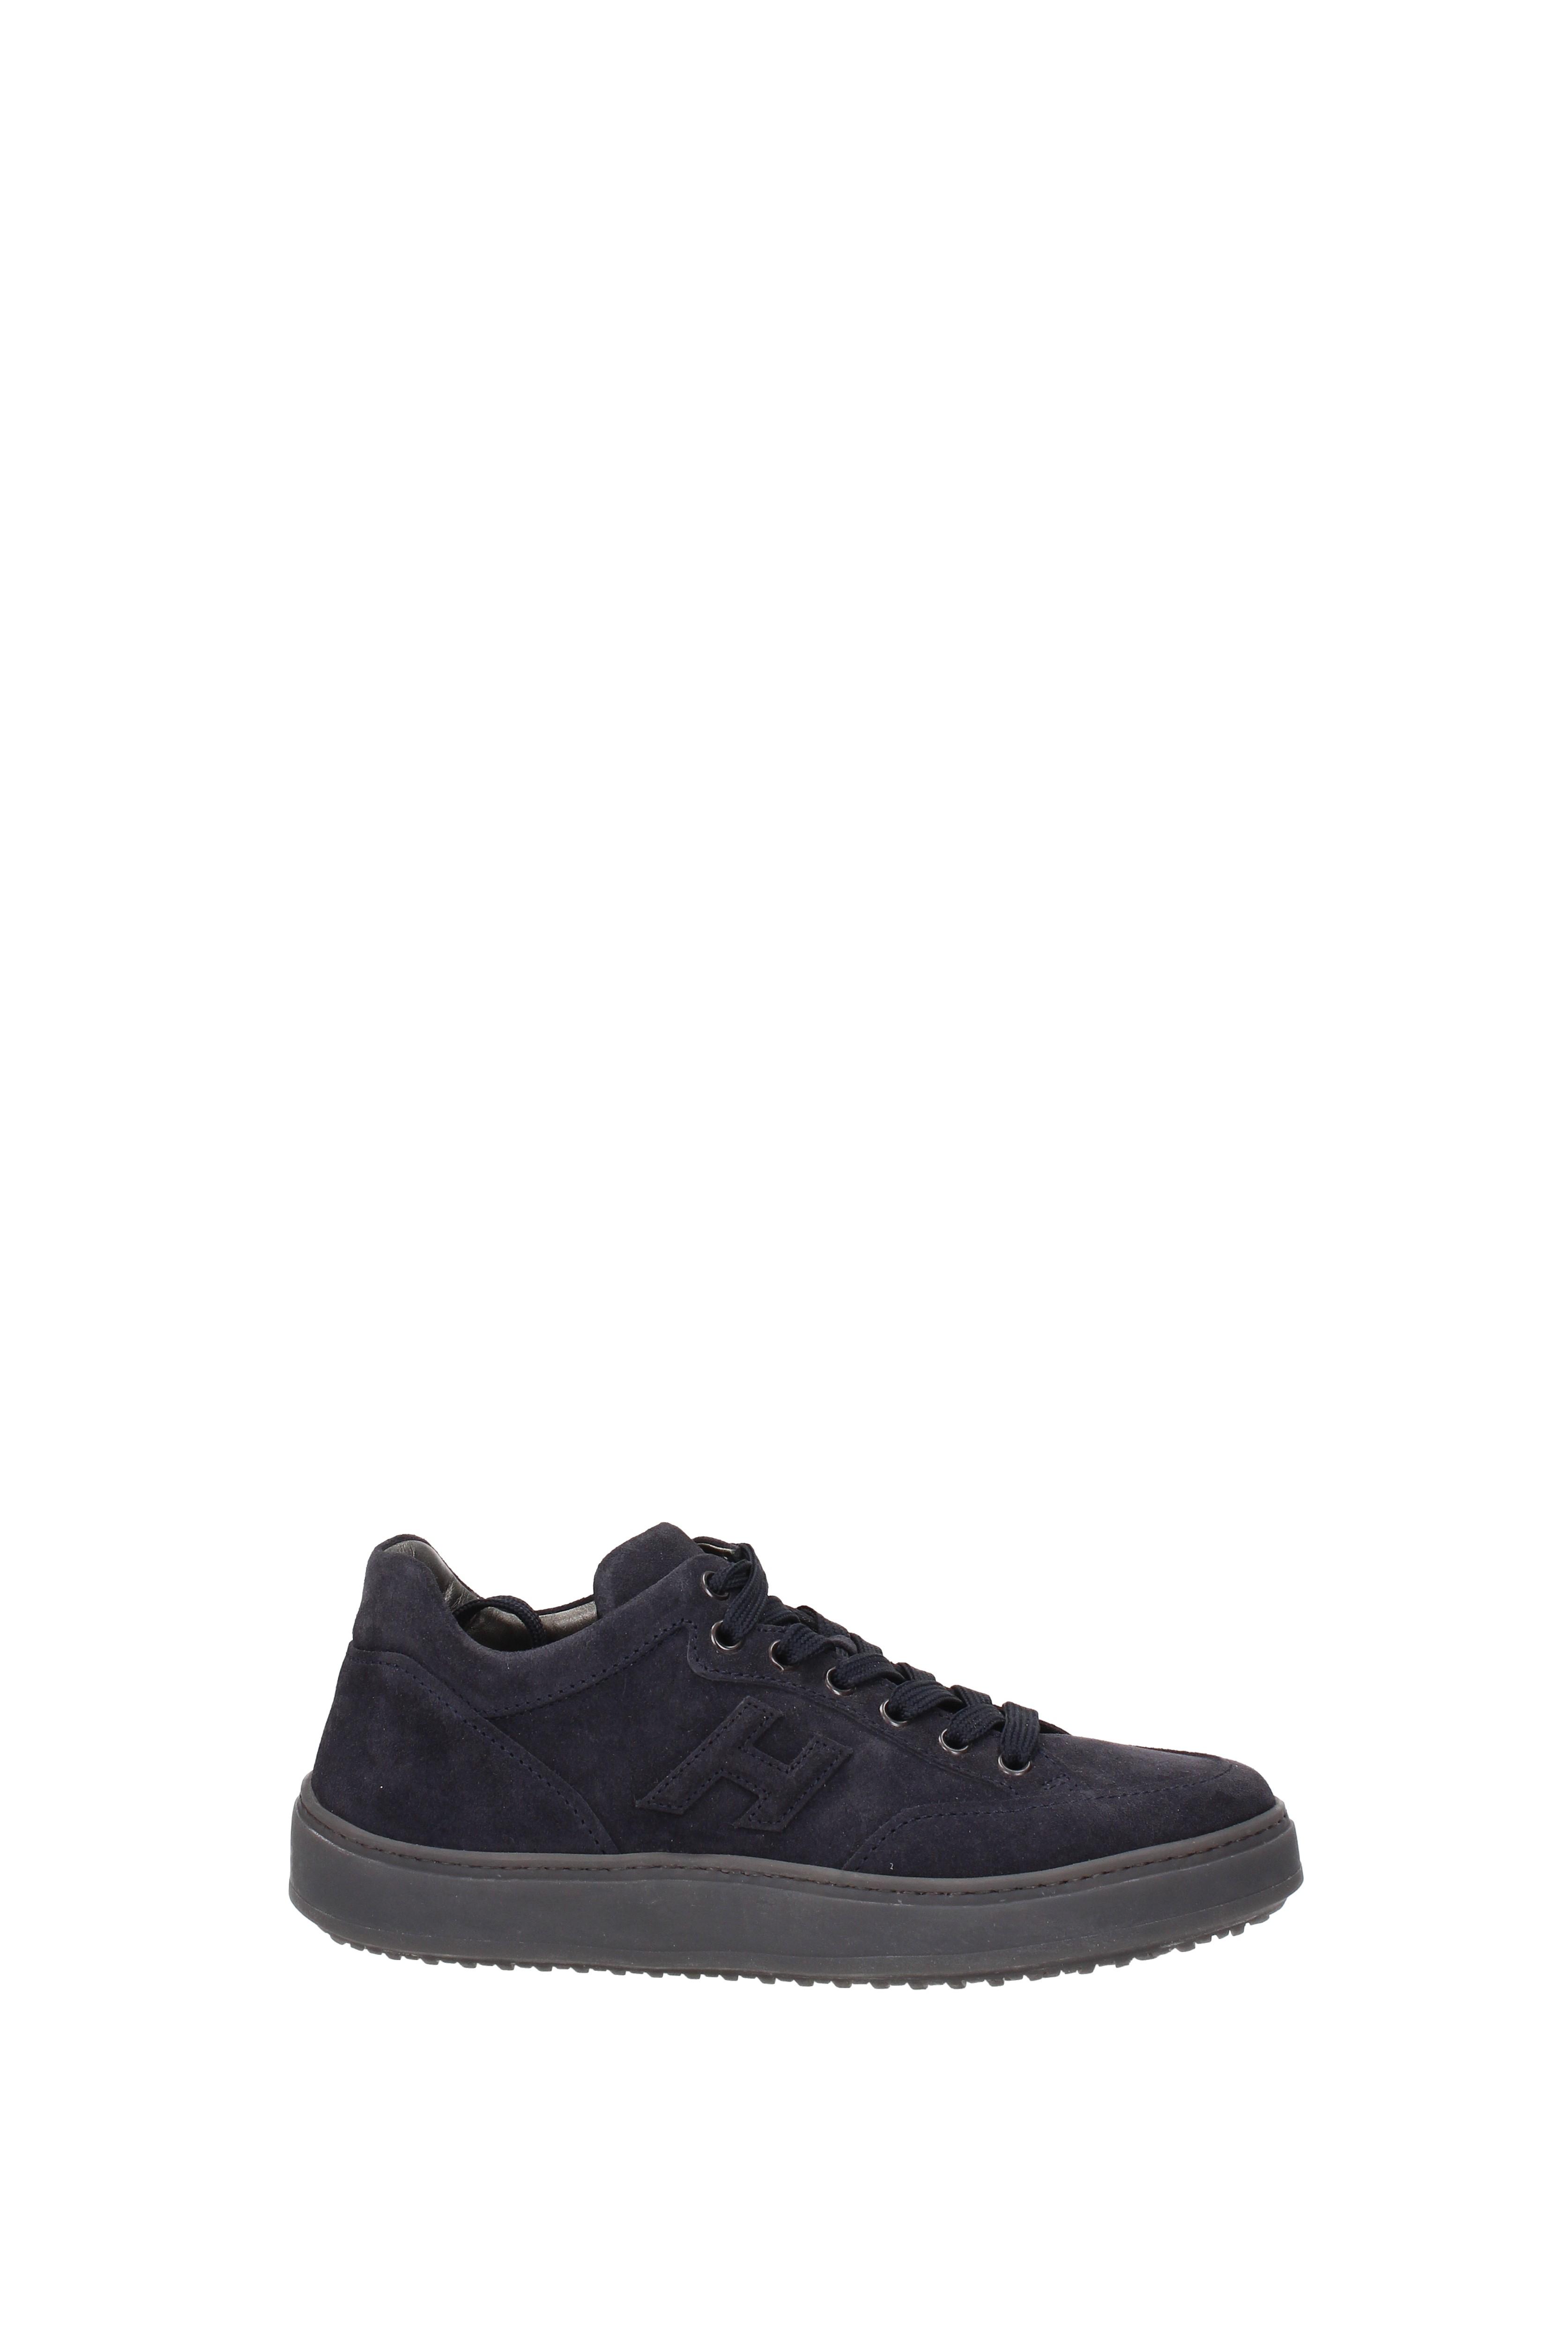 Sneakers (HXM3020W560HG0) Hogan Herren - Wildleder (HXM3020W560HG0) Sneakers 0b00e1